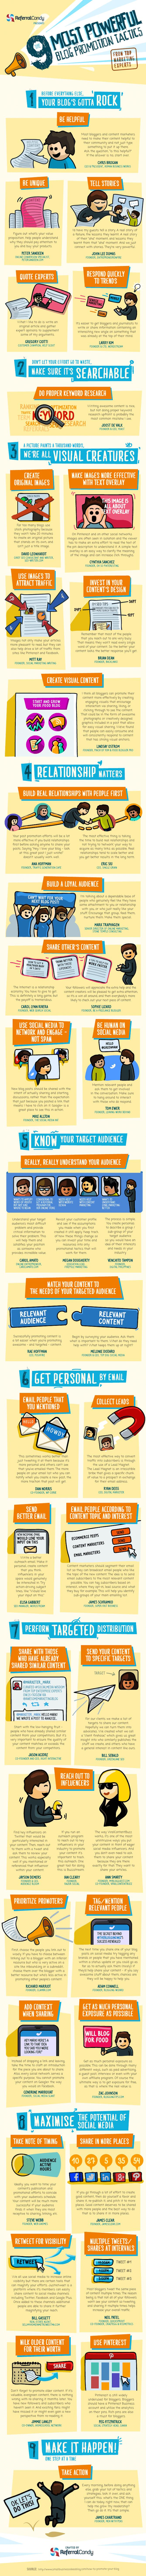 blog-promotion-tactics-infographic-compressor